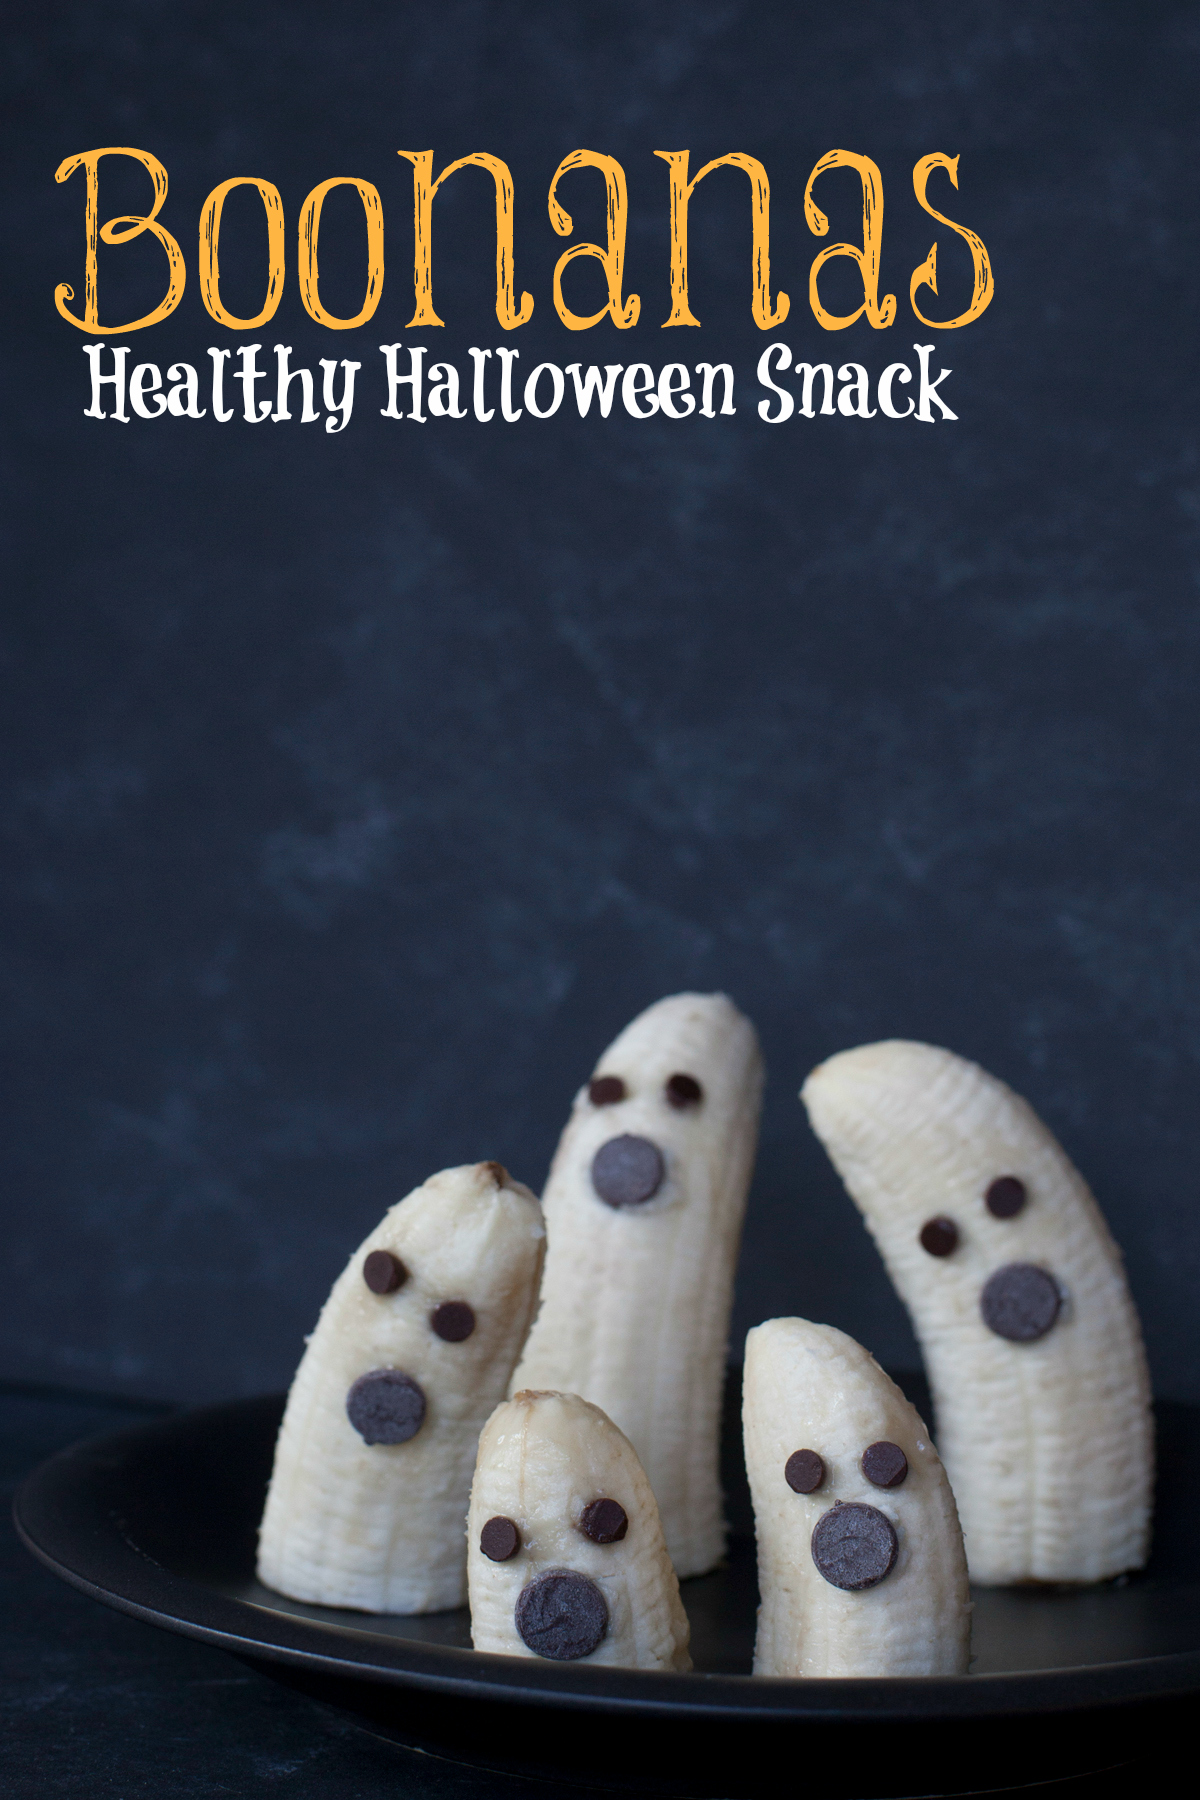 Healthy Kid Snack for Halloween: Boonanas